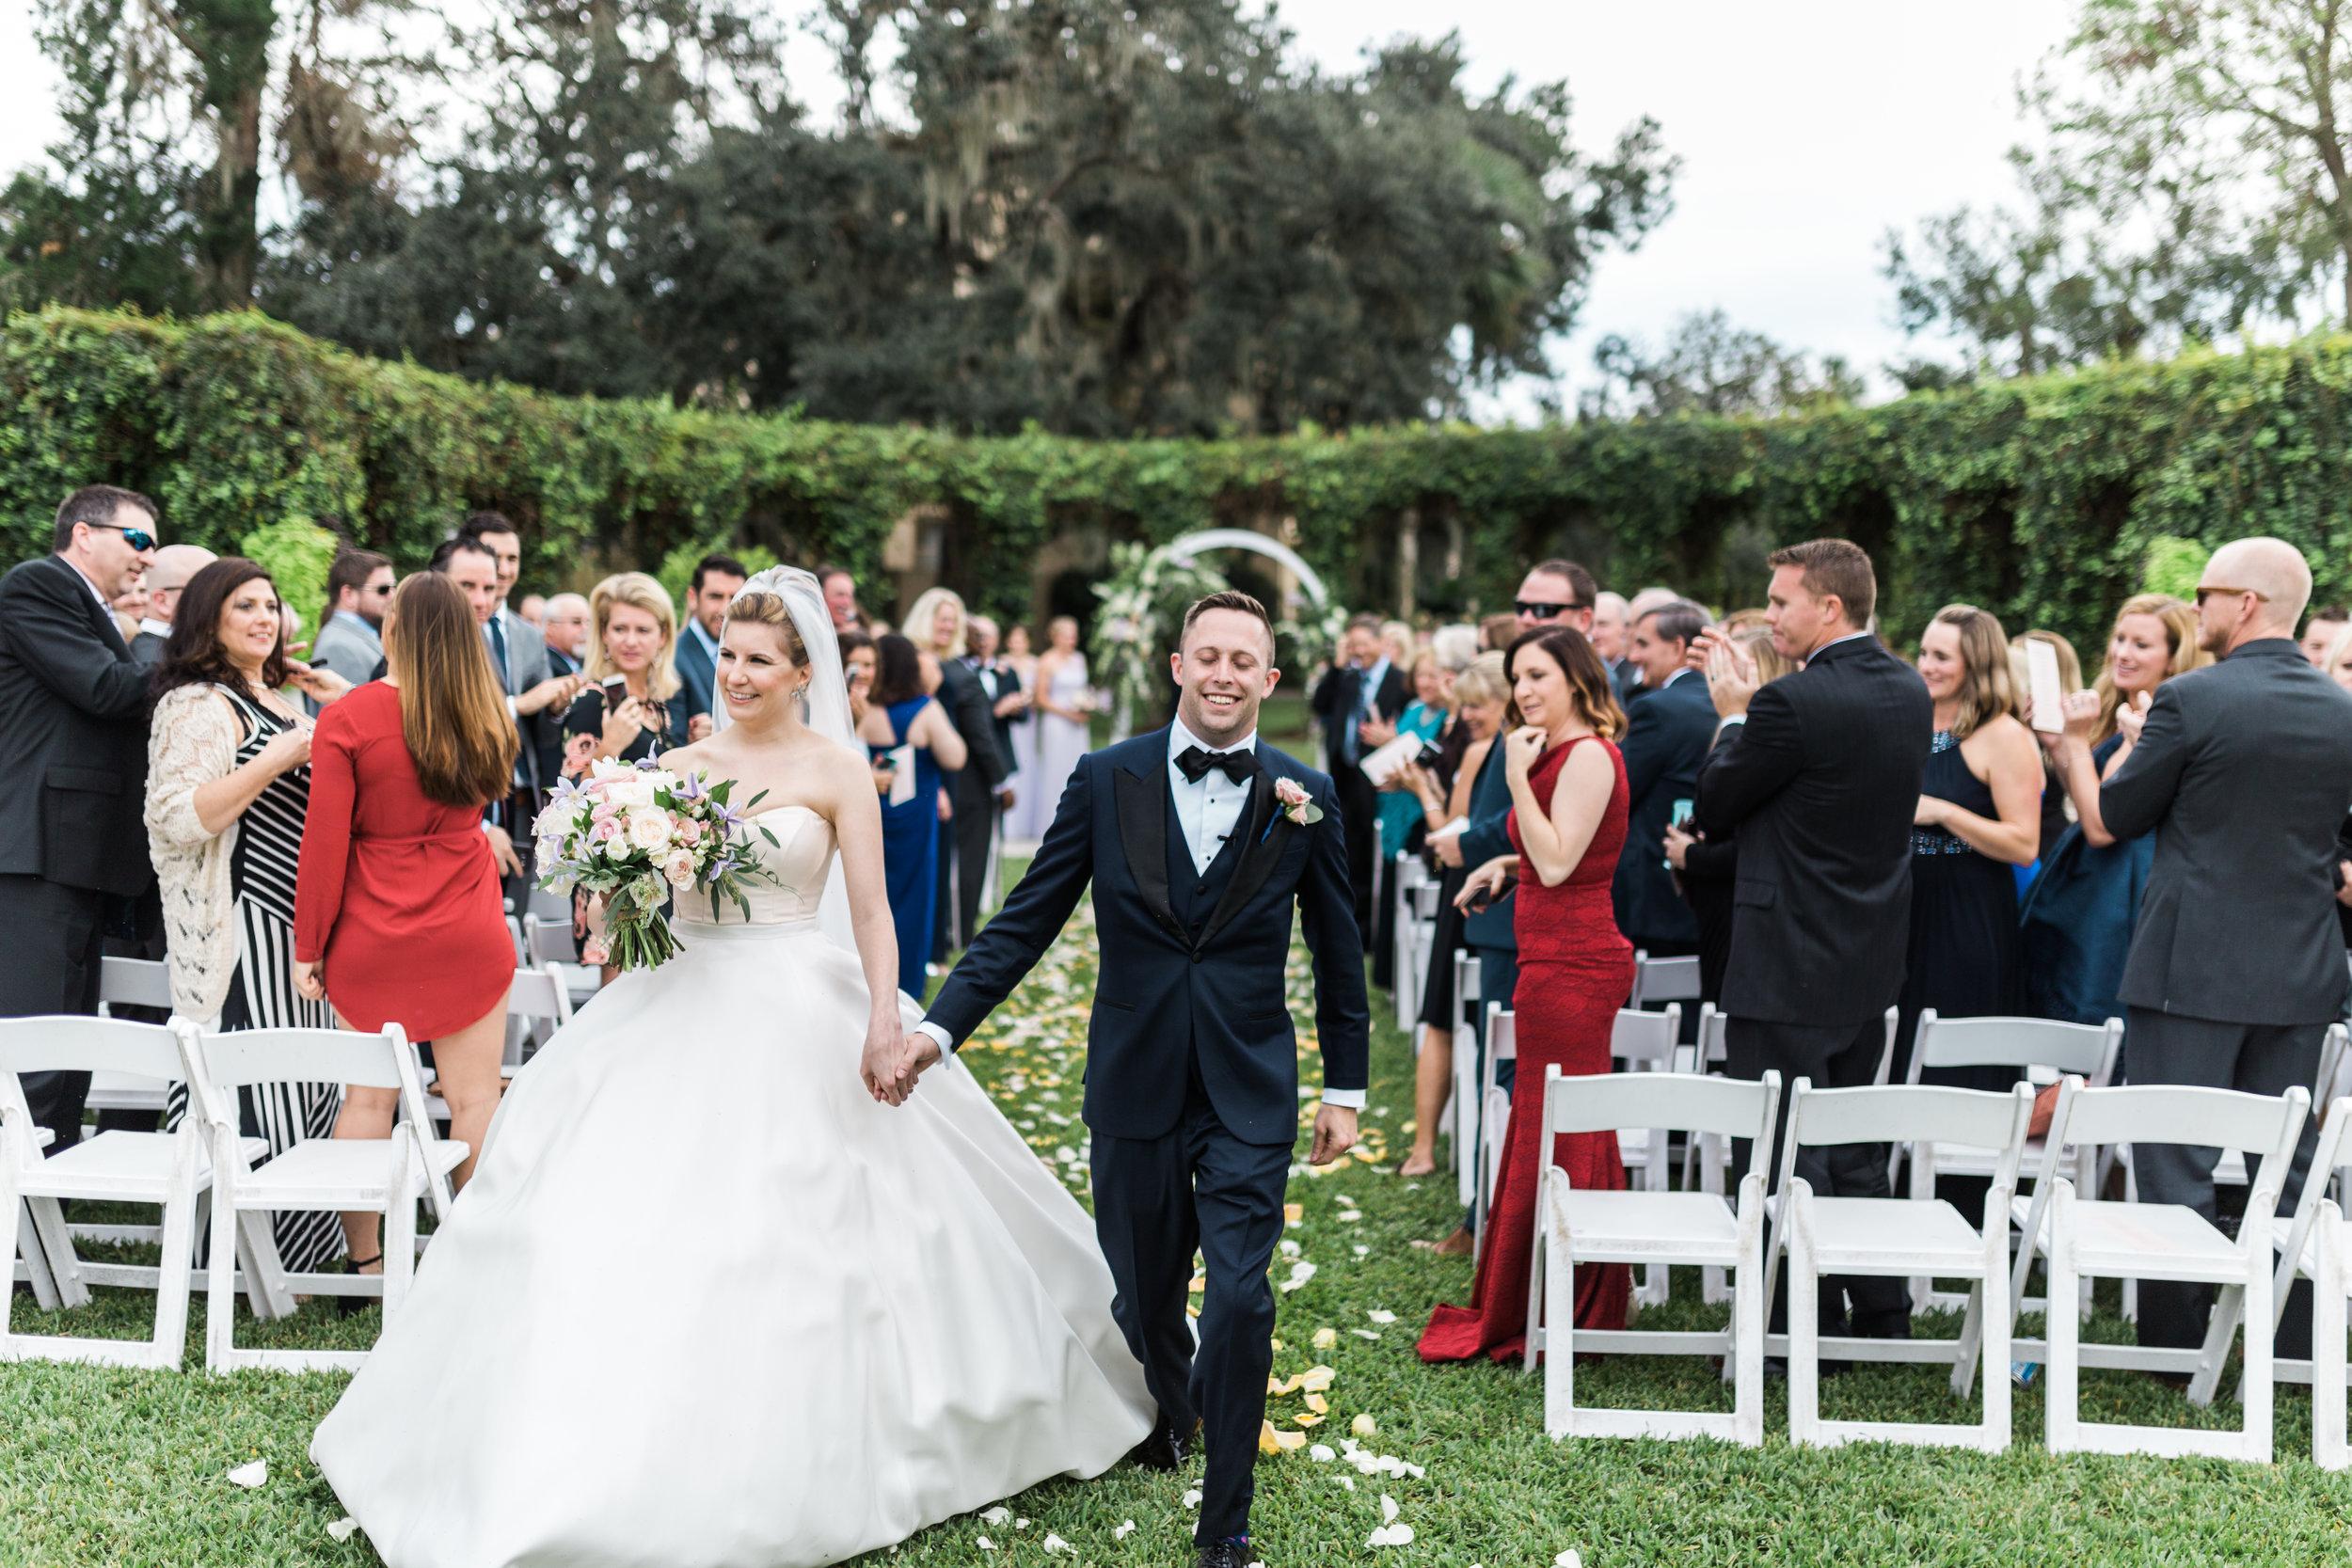 jekyll-island-resort-wedding-12.jpg